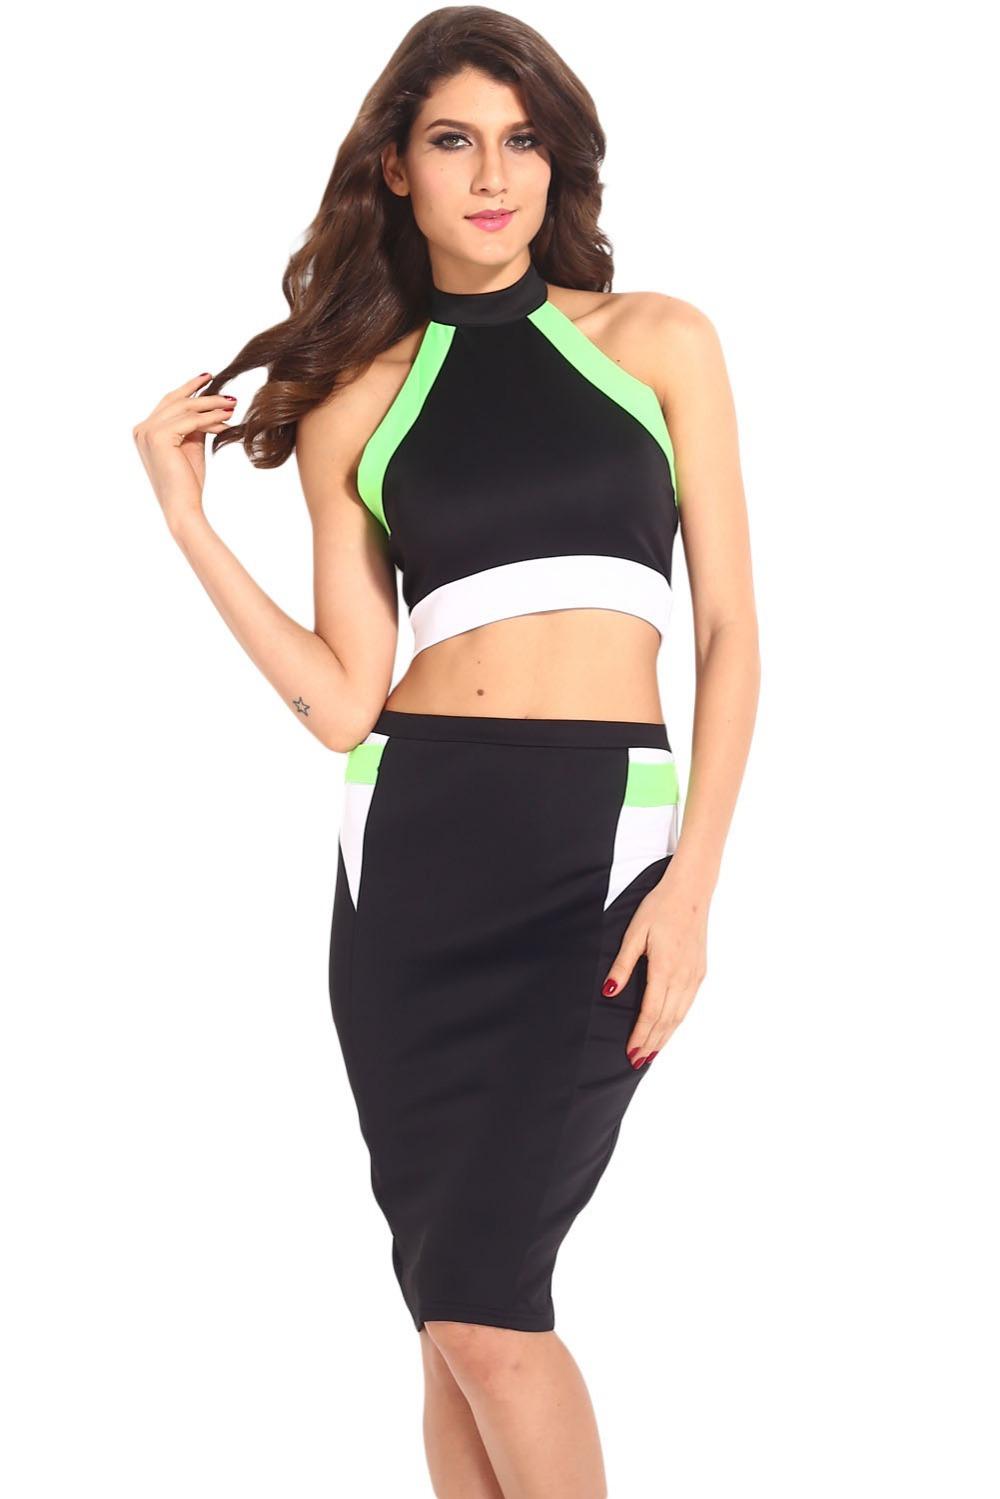 Sweet-Lover Zone new 2015 women Novelty Bandage Halter Top Knee Length Midi Dress Set club sexy gown long midi women dress(China (Mainland))